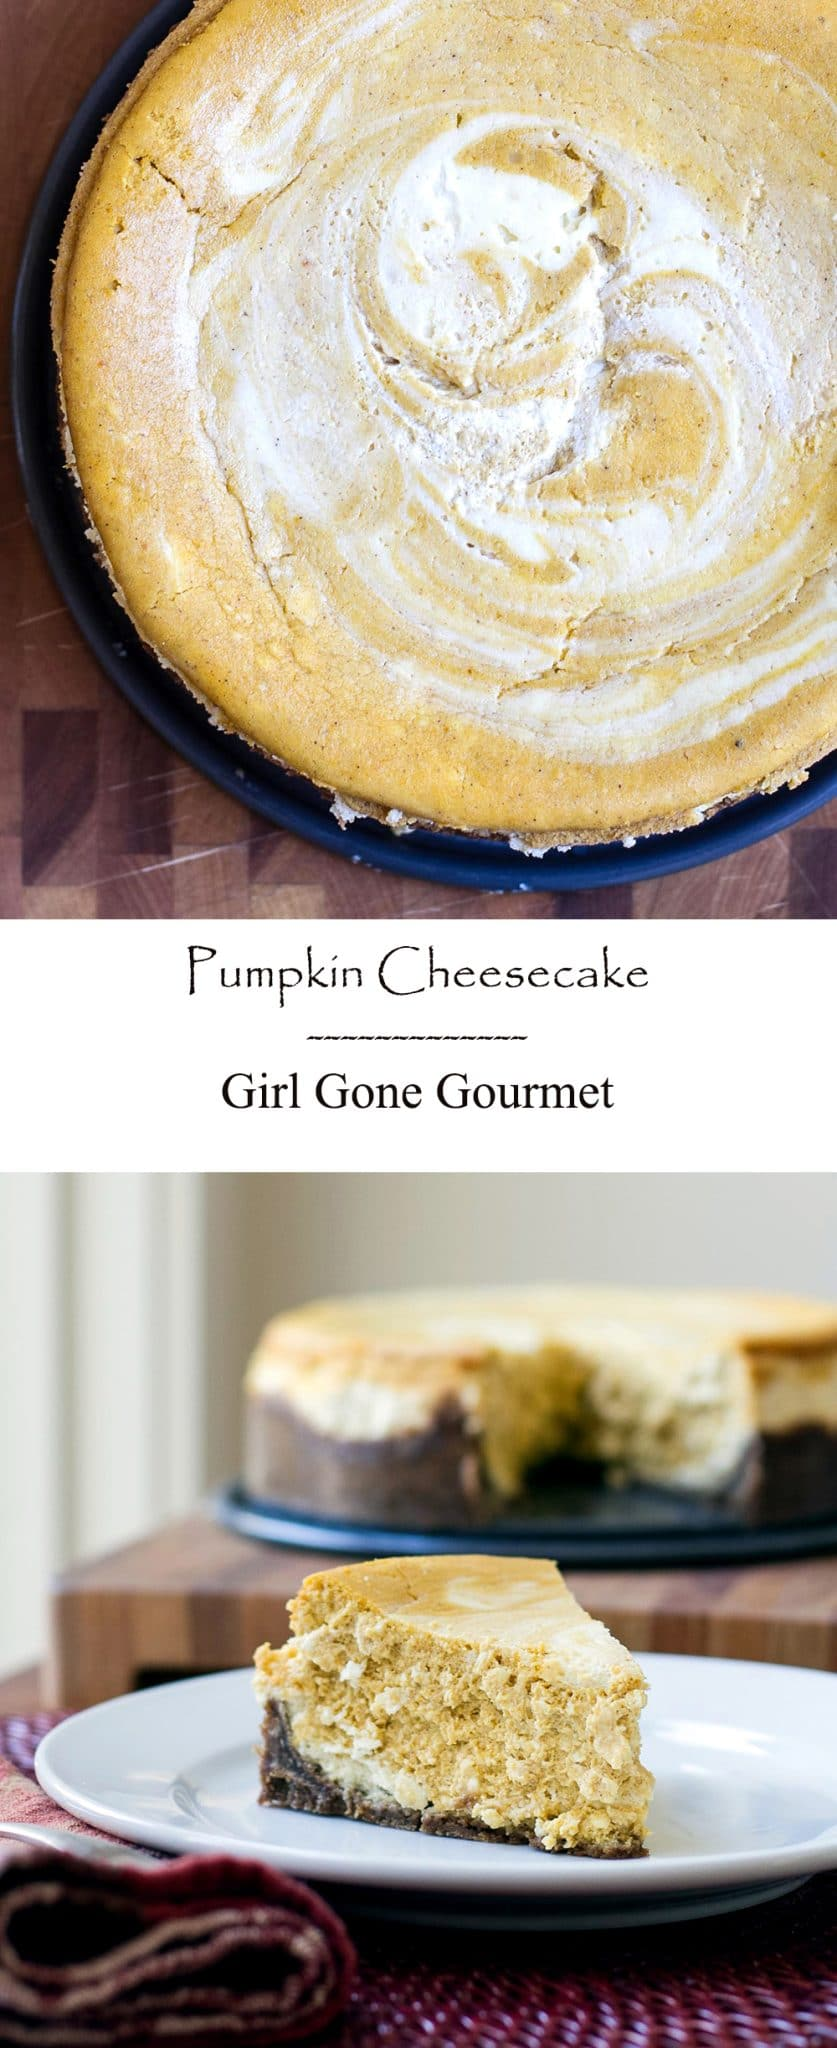 Pumpkin Cheesecake | Girl Gone Gourmet